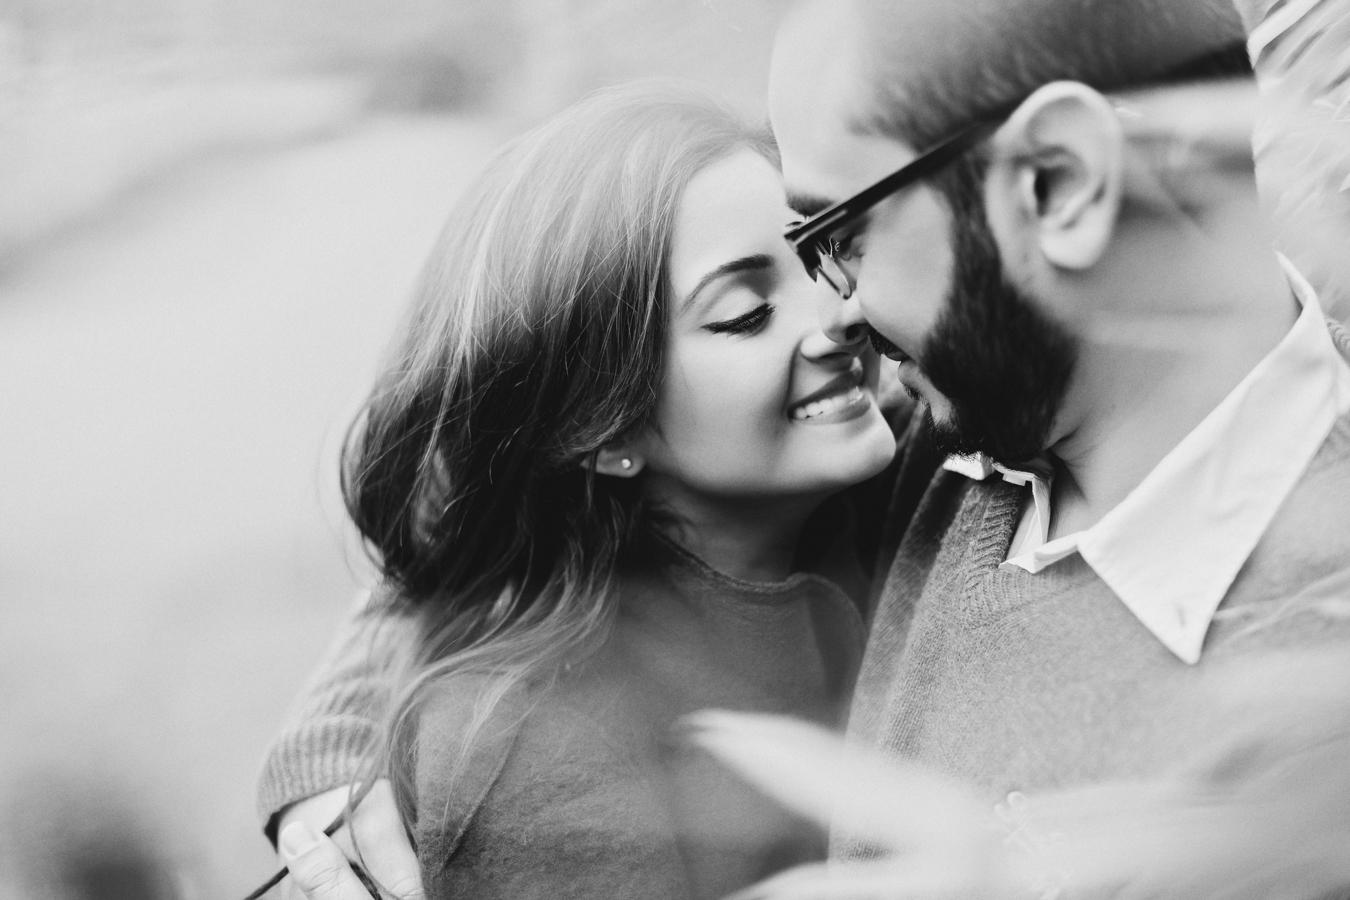 627a2fa2f4b34 ممارسة العلاقة الجنسية بانتظام تؤدي بشكل مباشر إلى تطور وتقوية الحياة  العاطفية بين الزوجين فتبادل الأحاديث قبل وأثناء وبعد العلاقة الجنسية تجعل  عملية ...